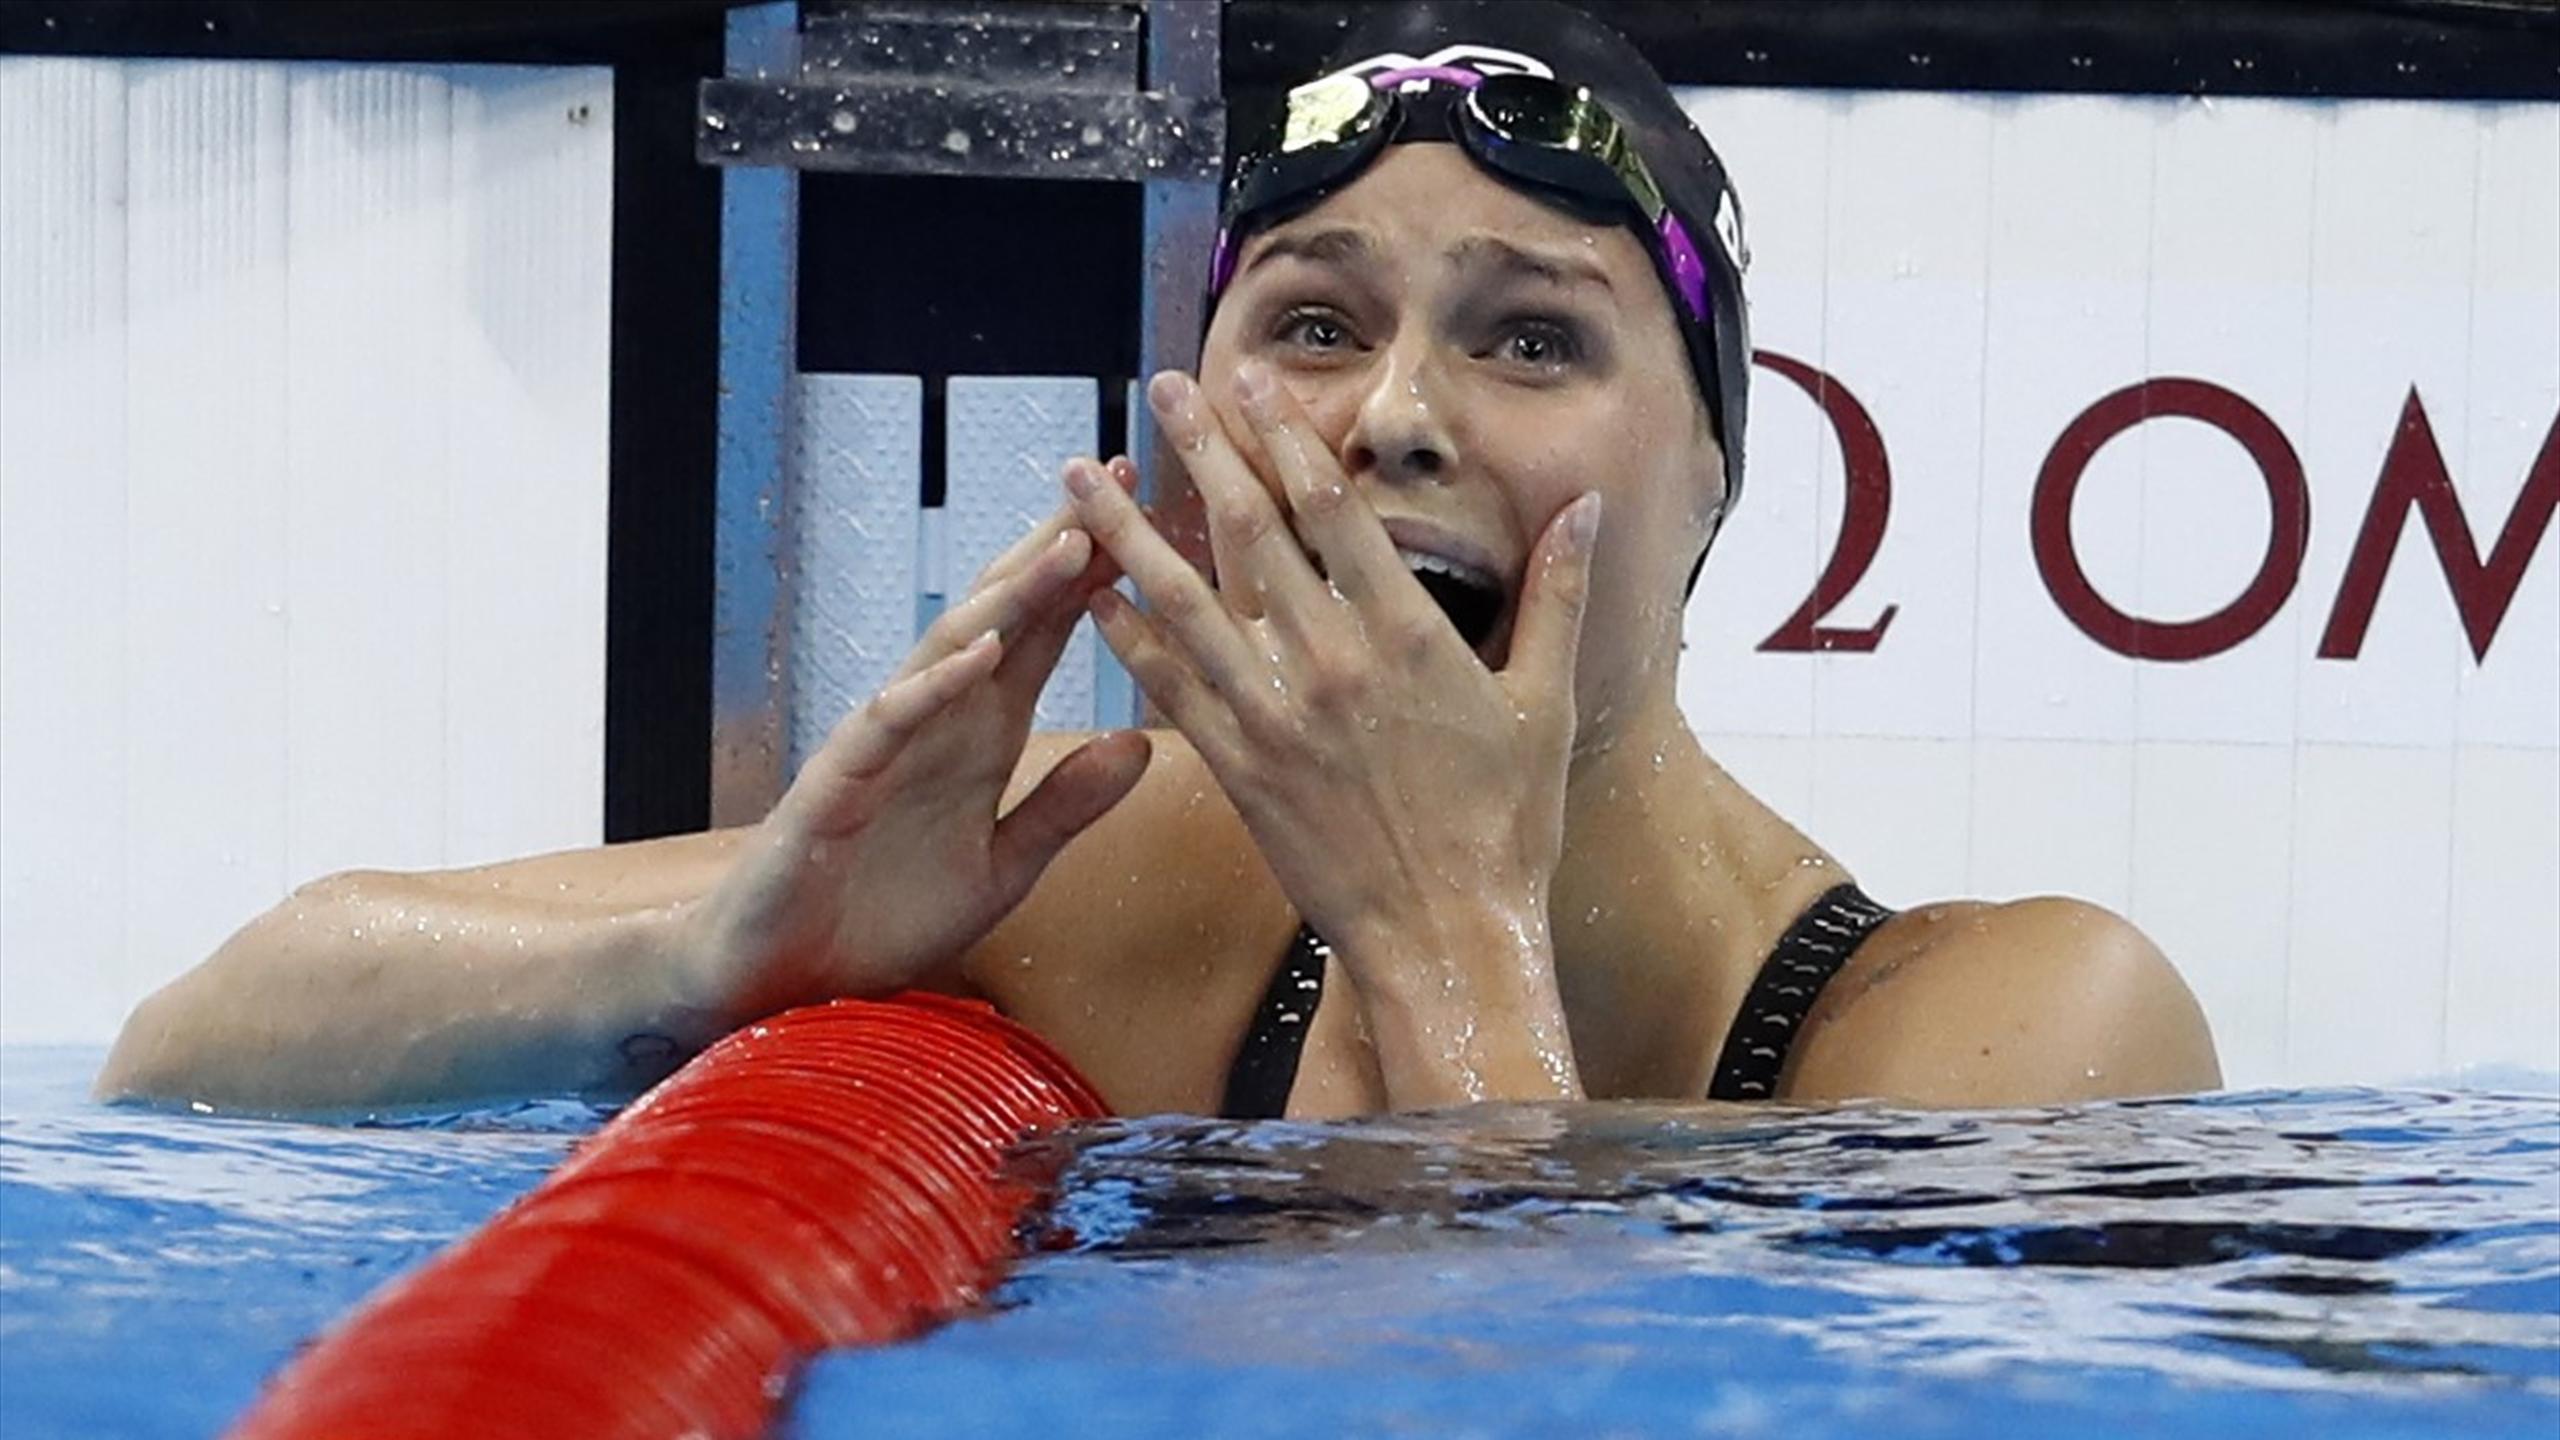 виды спорта олимпиады в рио 2016